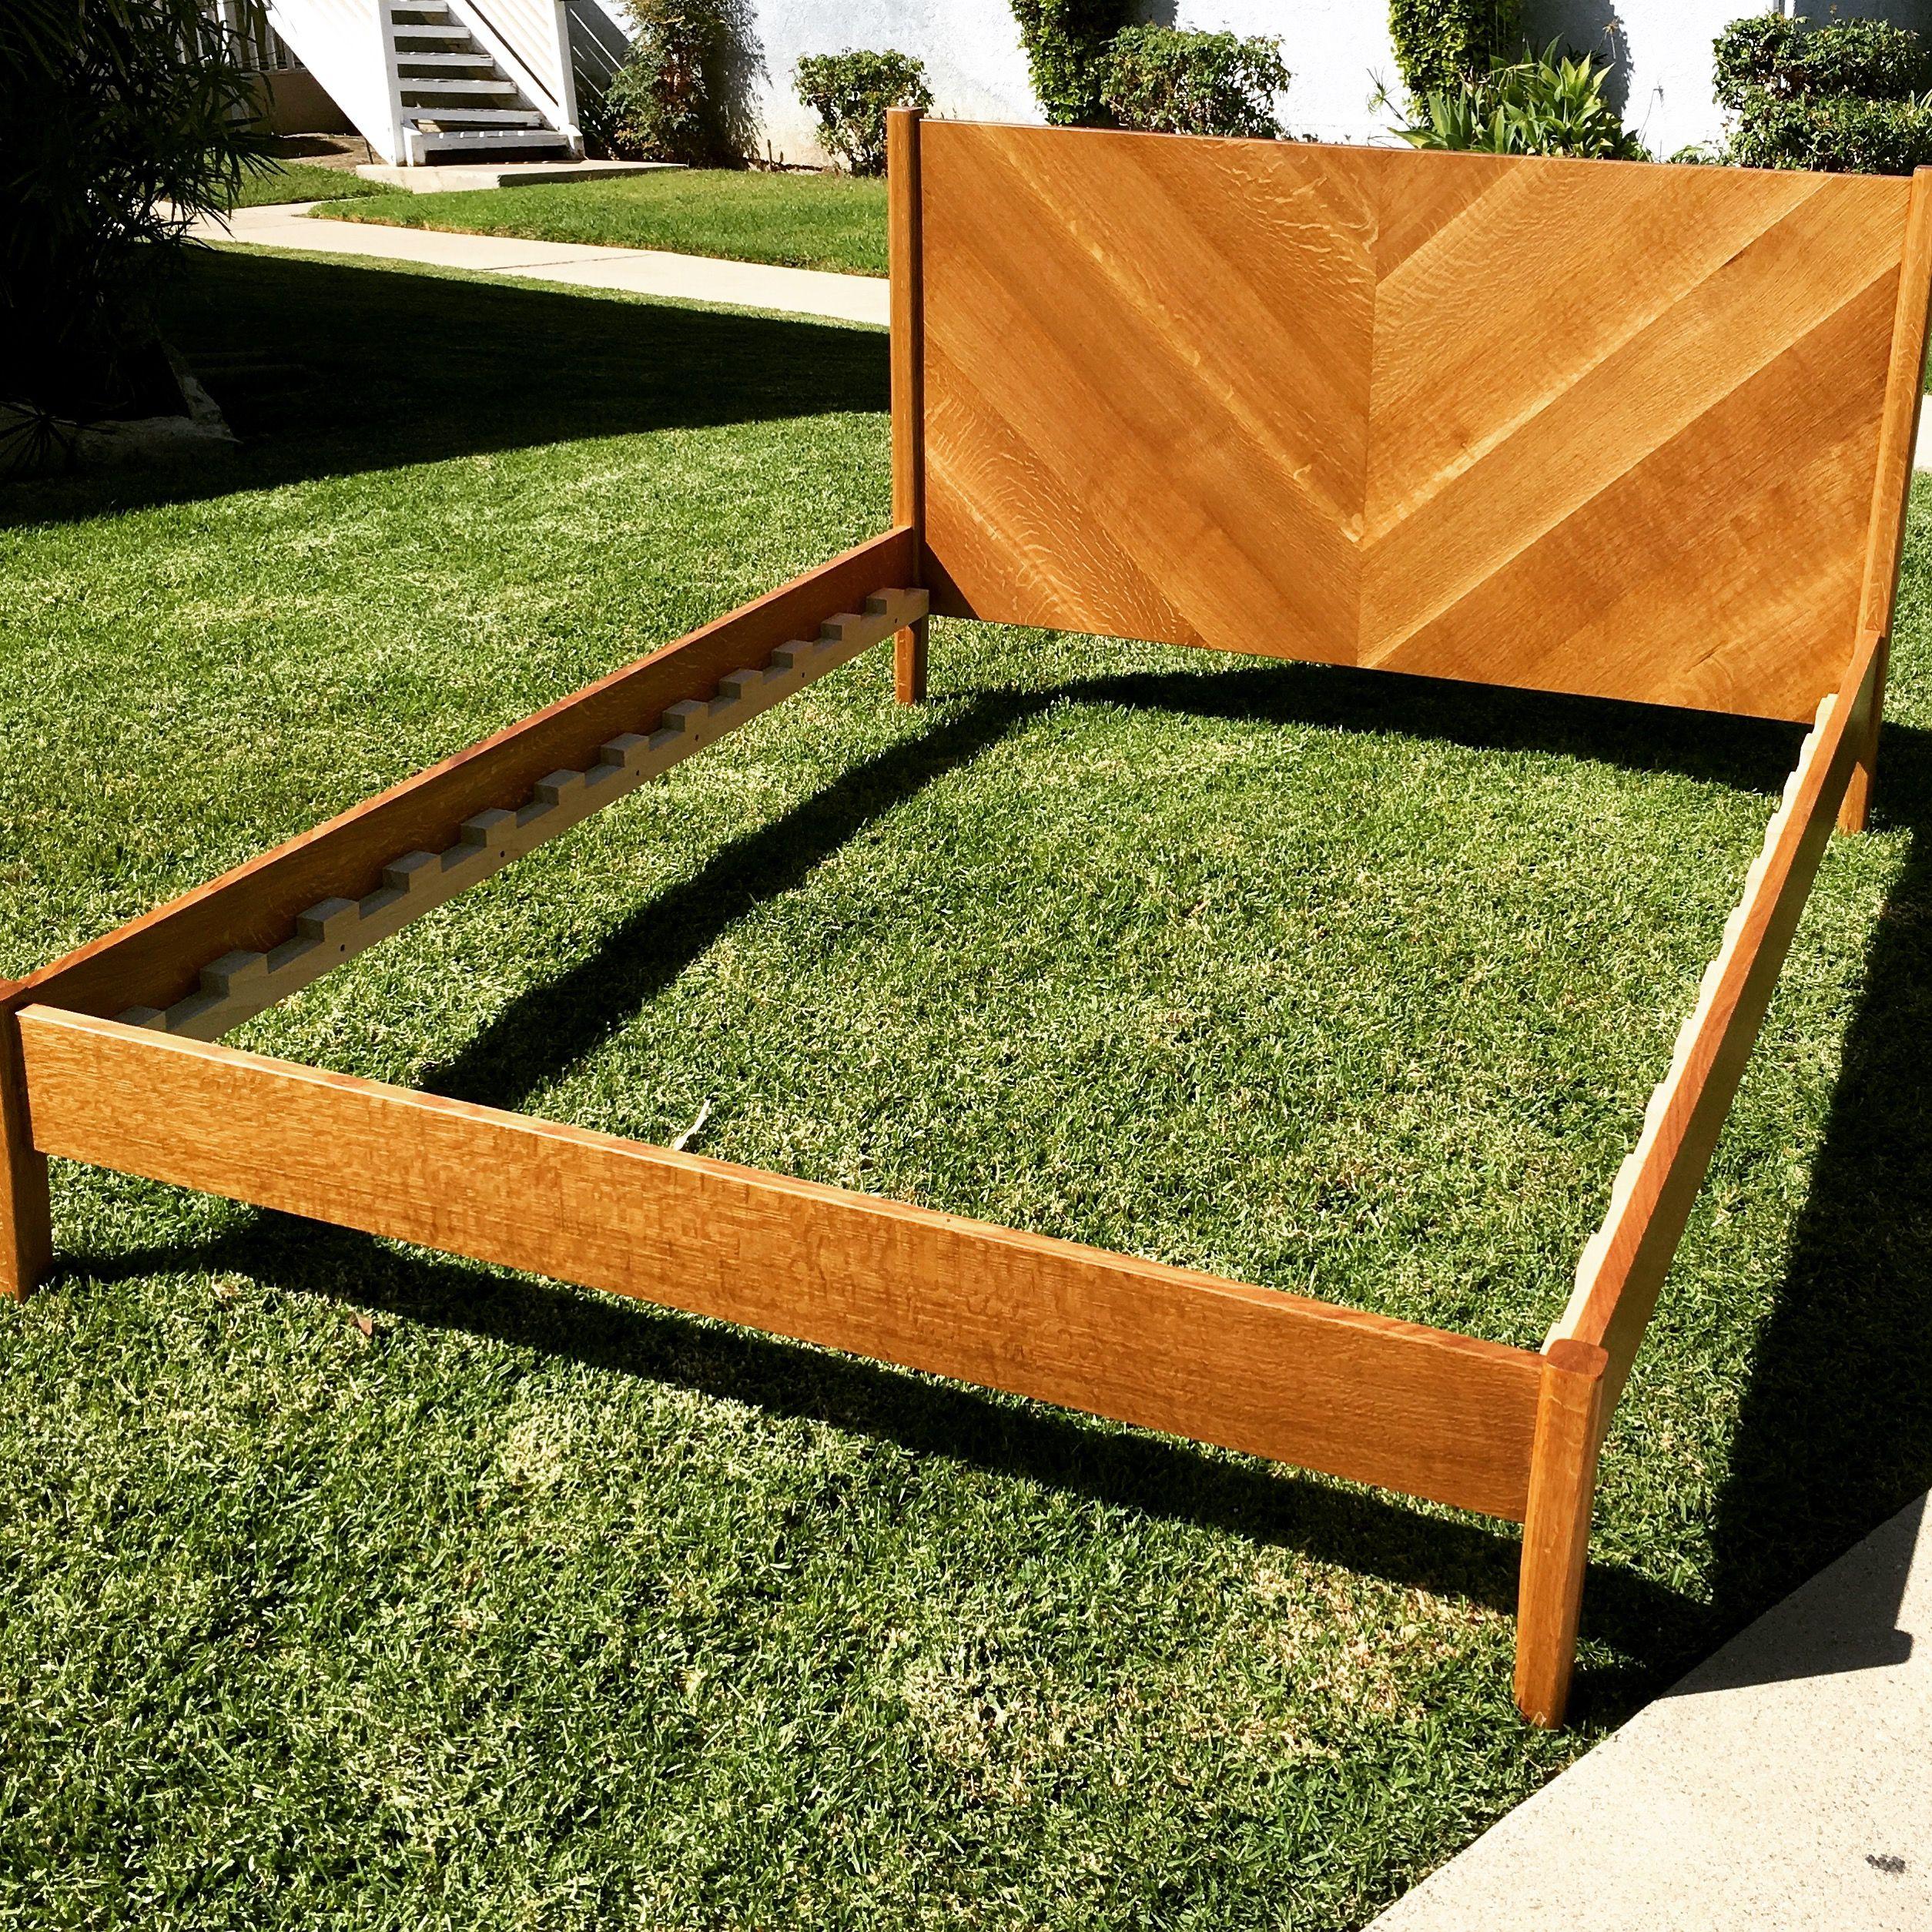 Quatersawn white oak bed frame Oak bed frame, Furniture